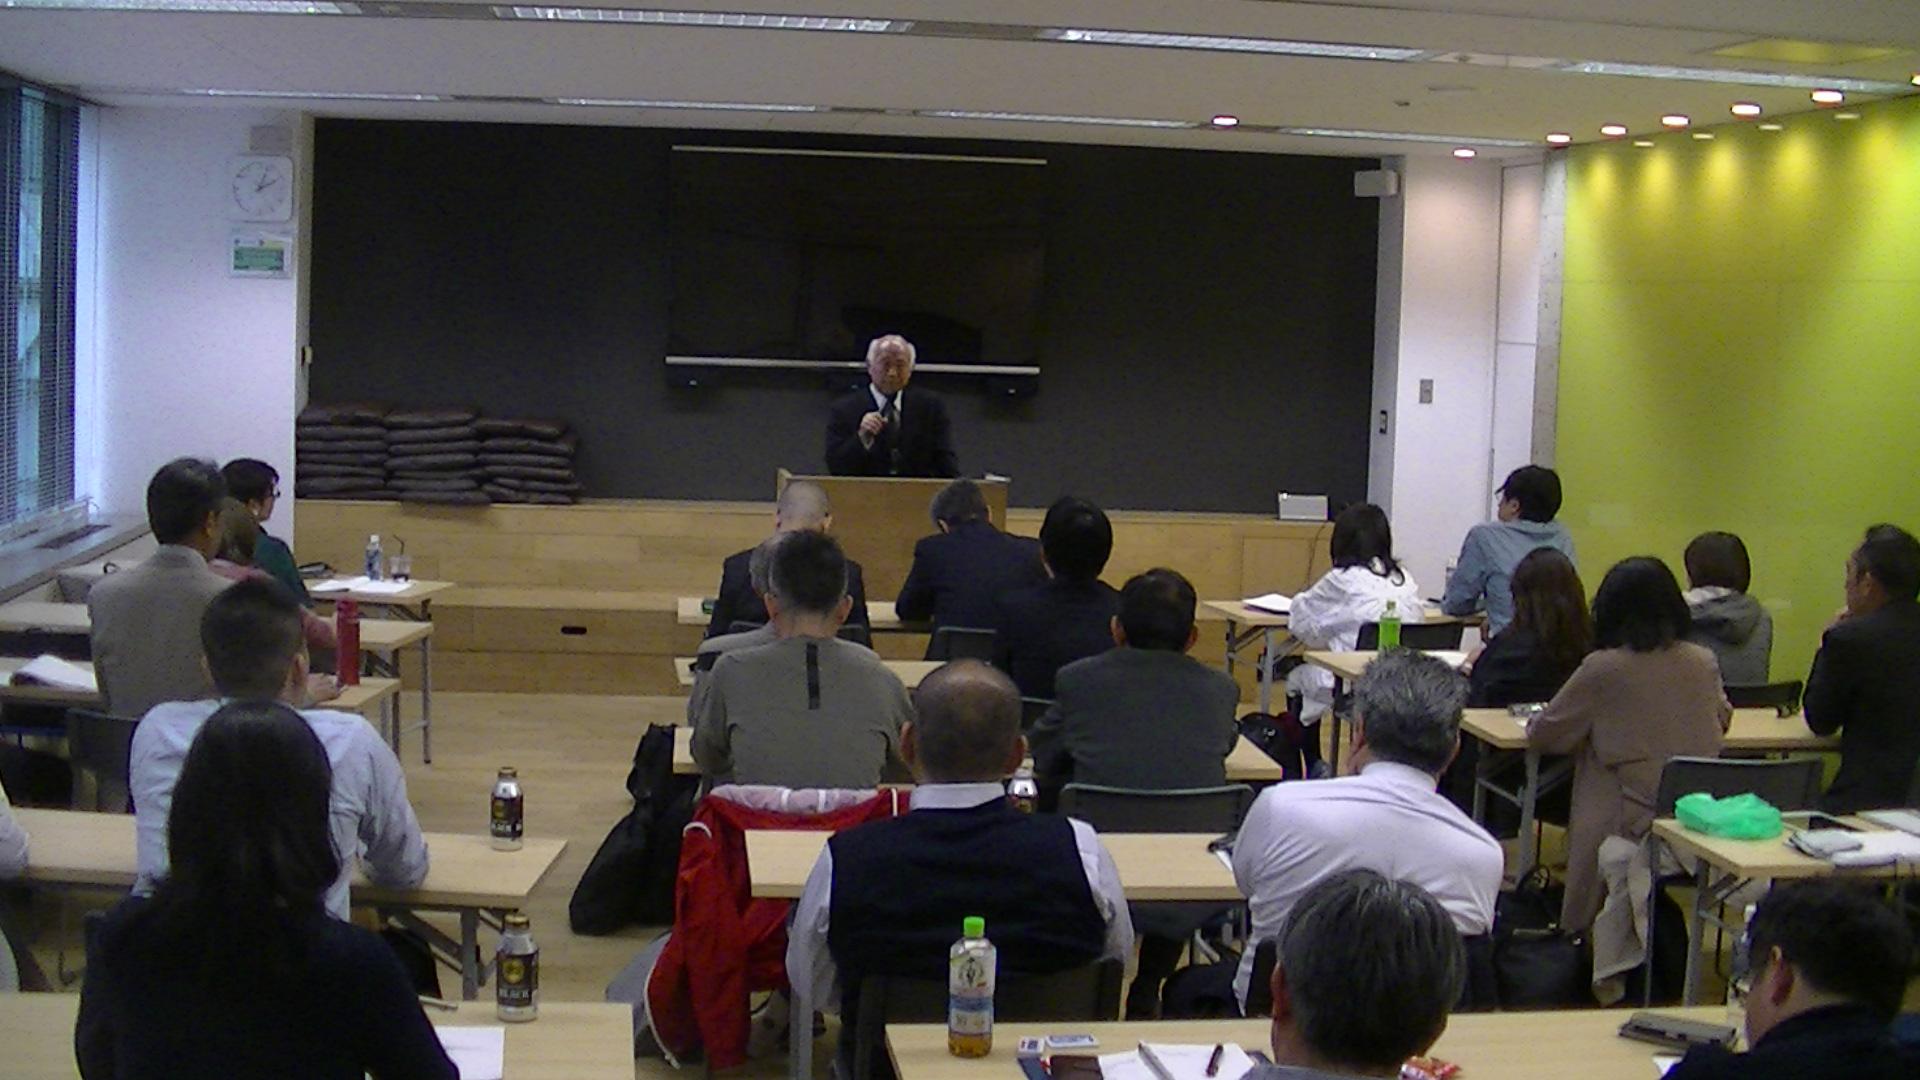 PIC 0778 - 思風会全国大会in広島